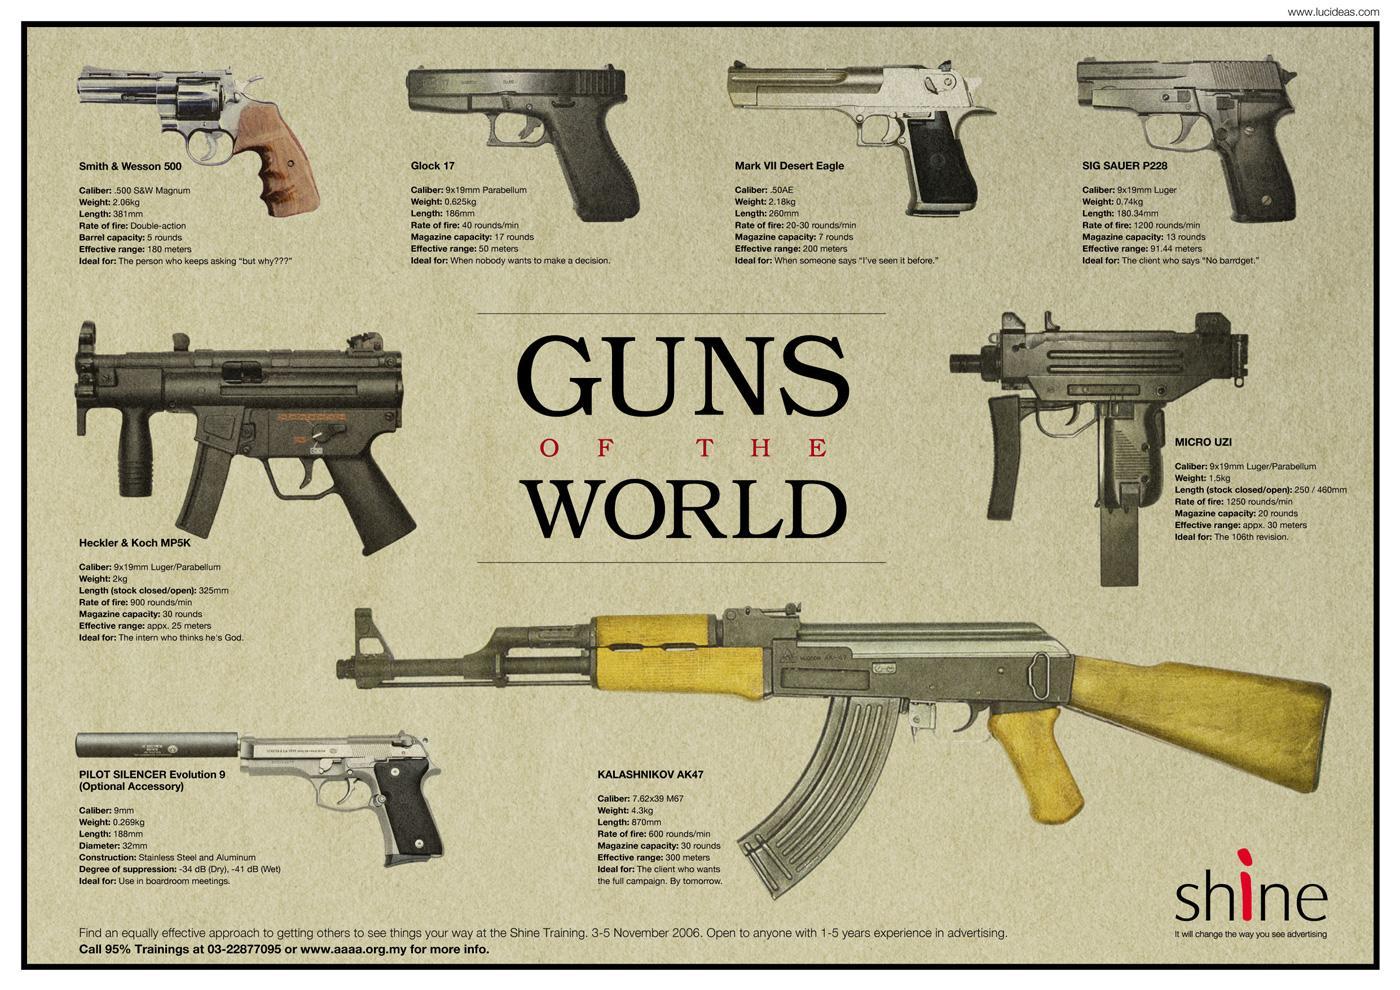 Guns of the World